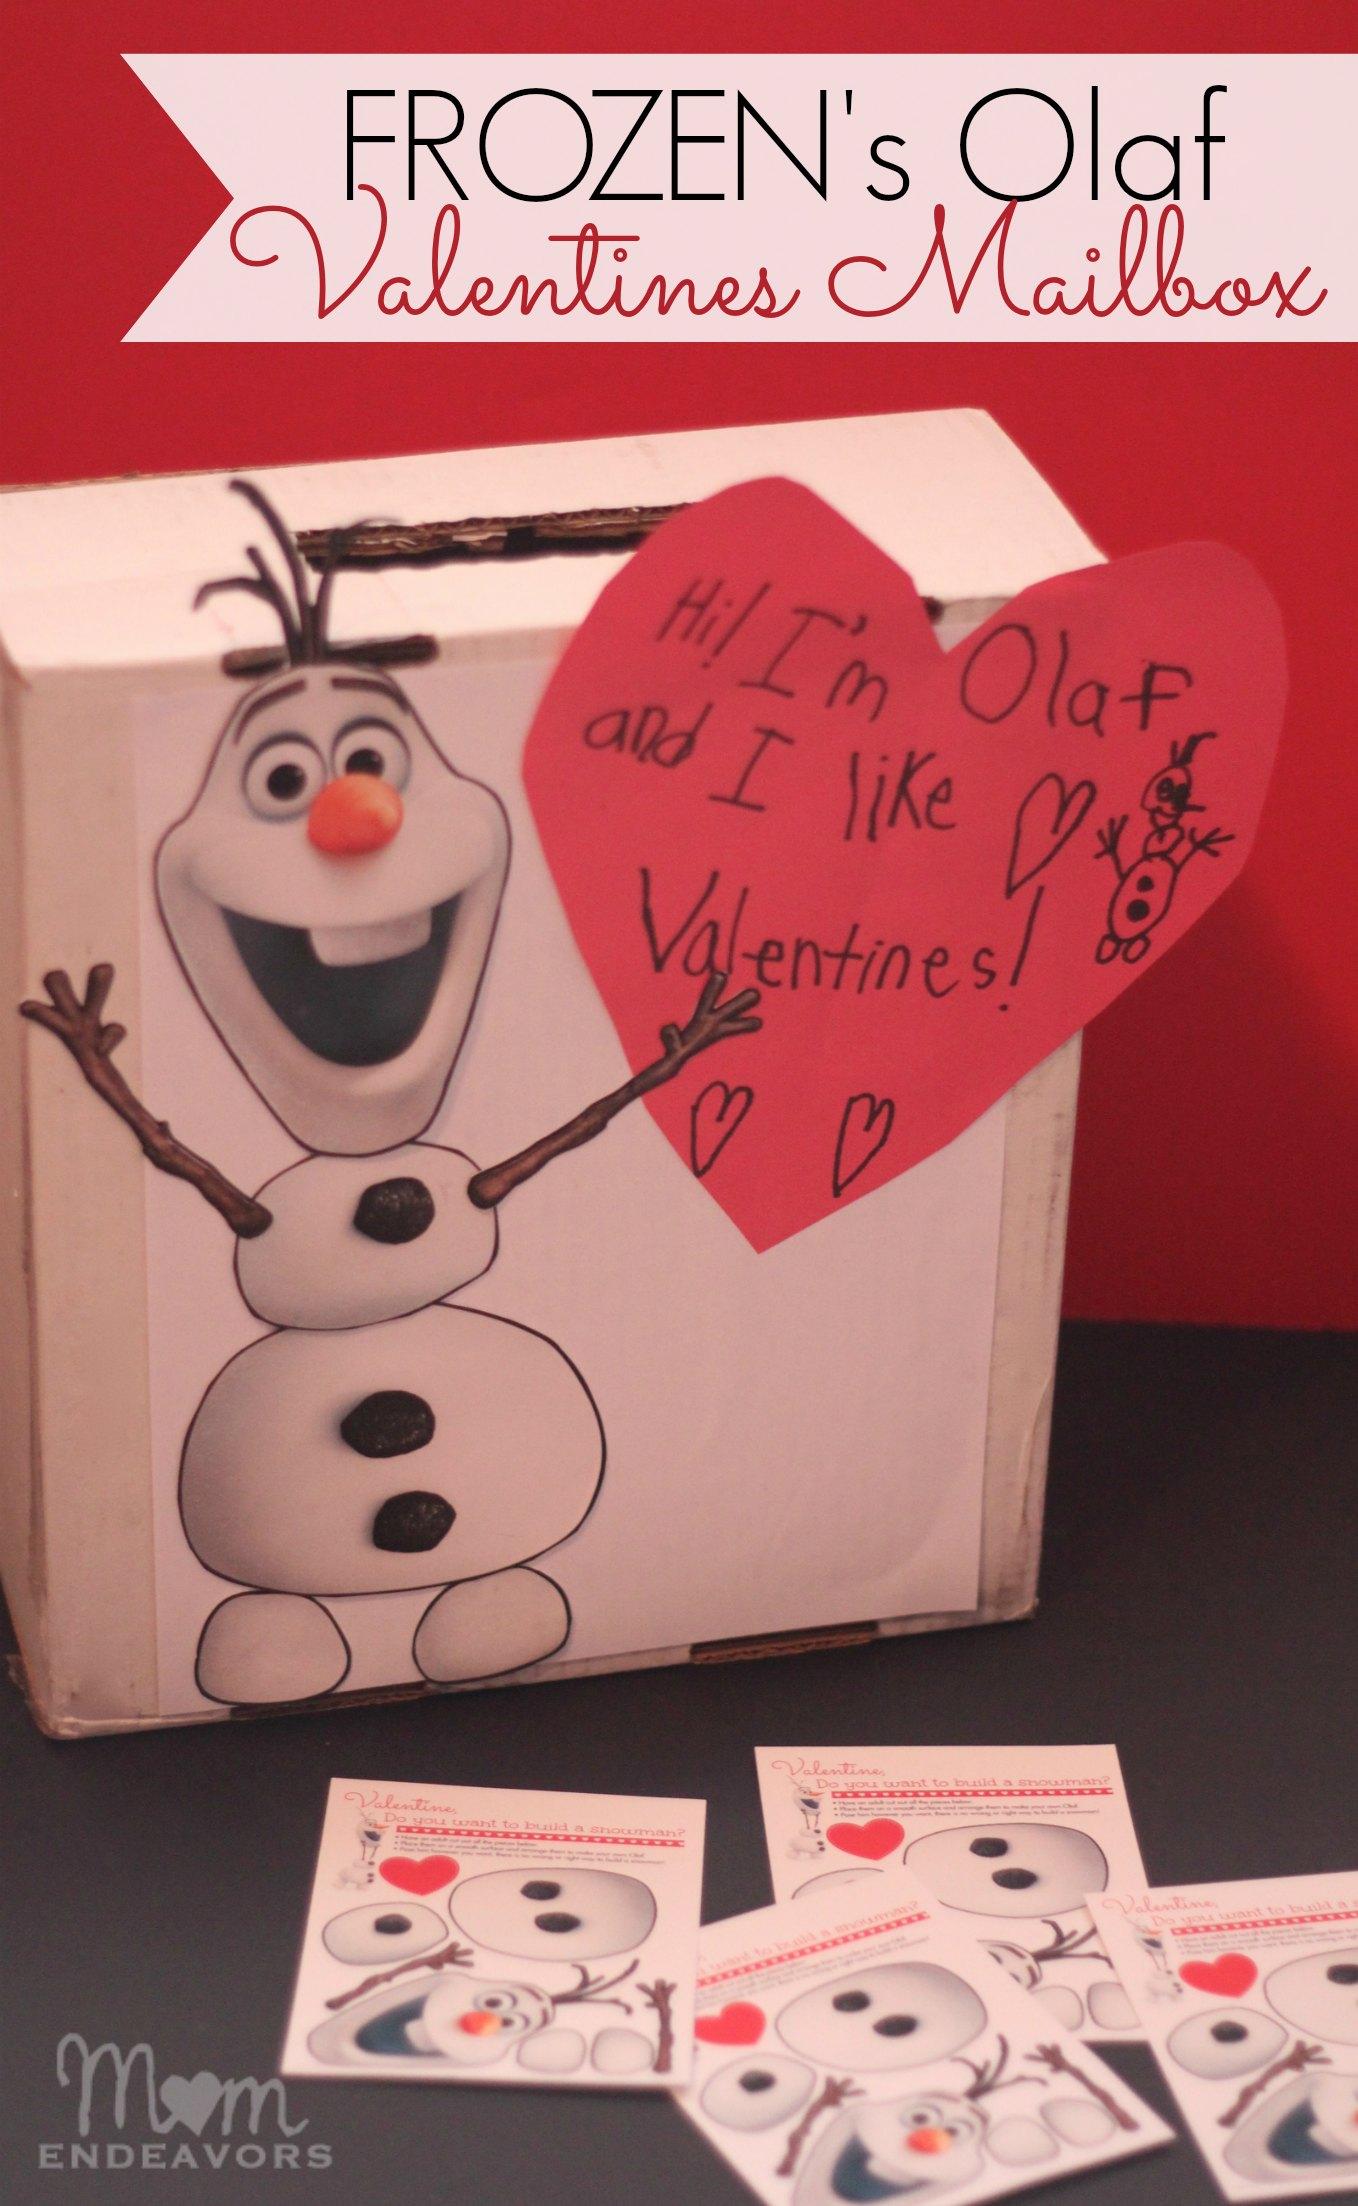 10 FREE Disney FROZEN Printable Valentines – Disney Valentine Cards Printable